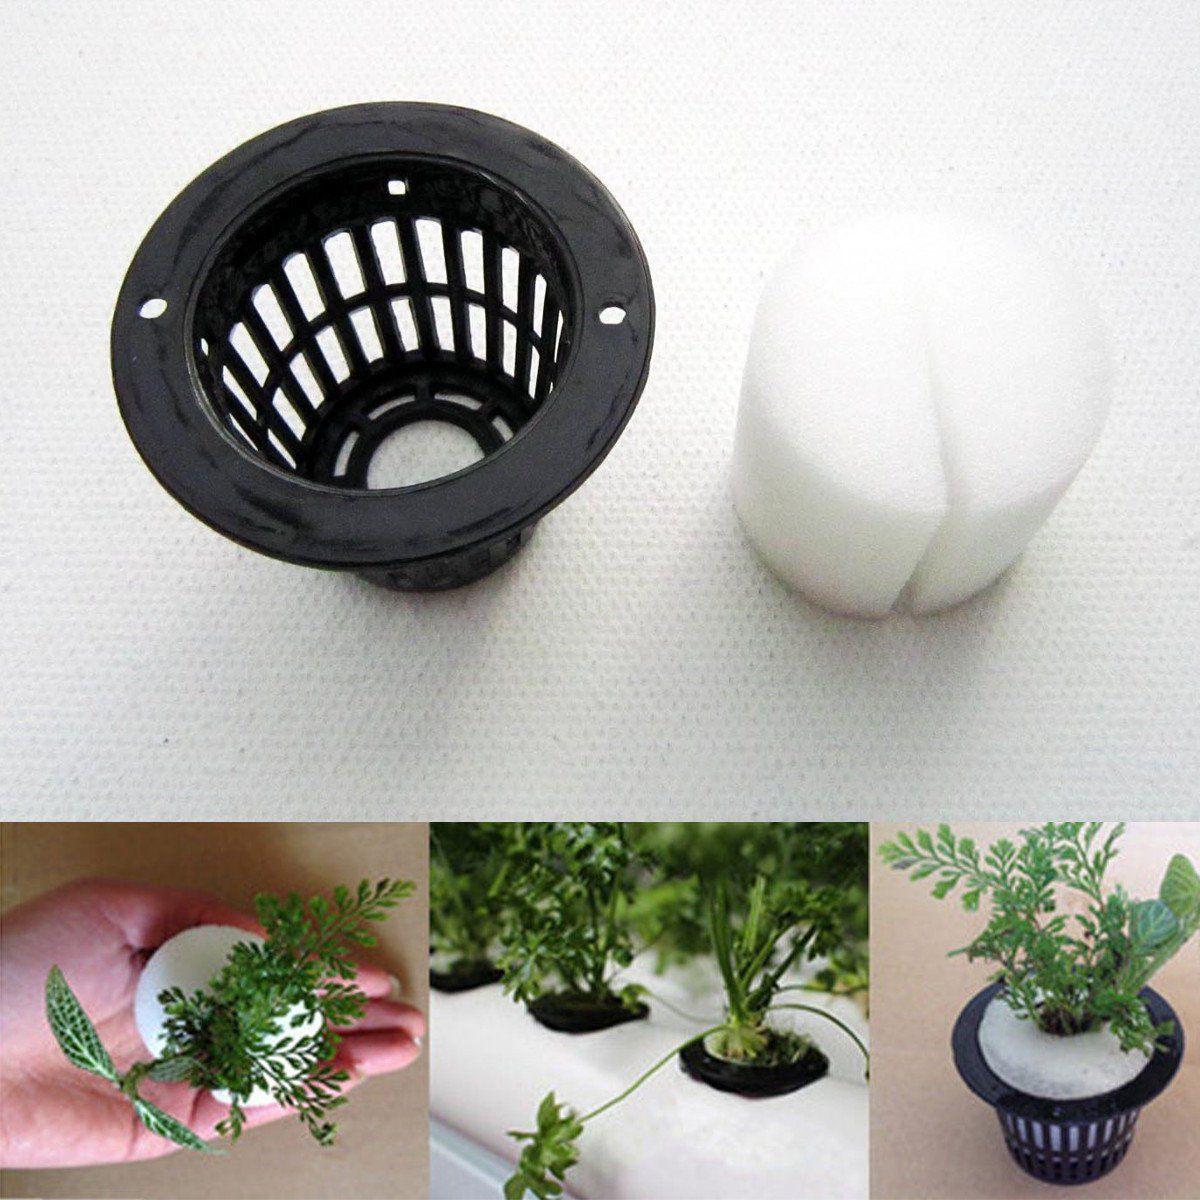 Mesh Pot Net Cup Basket Hydroponic System Garden Plant Cloning Foam Insert Seeds